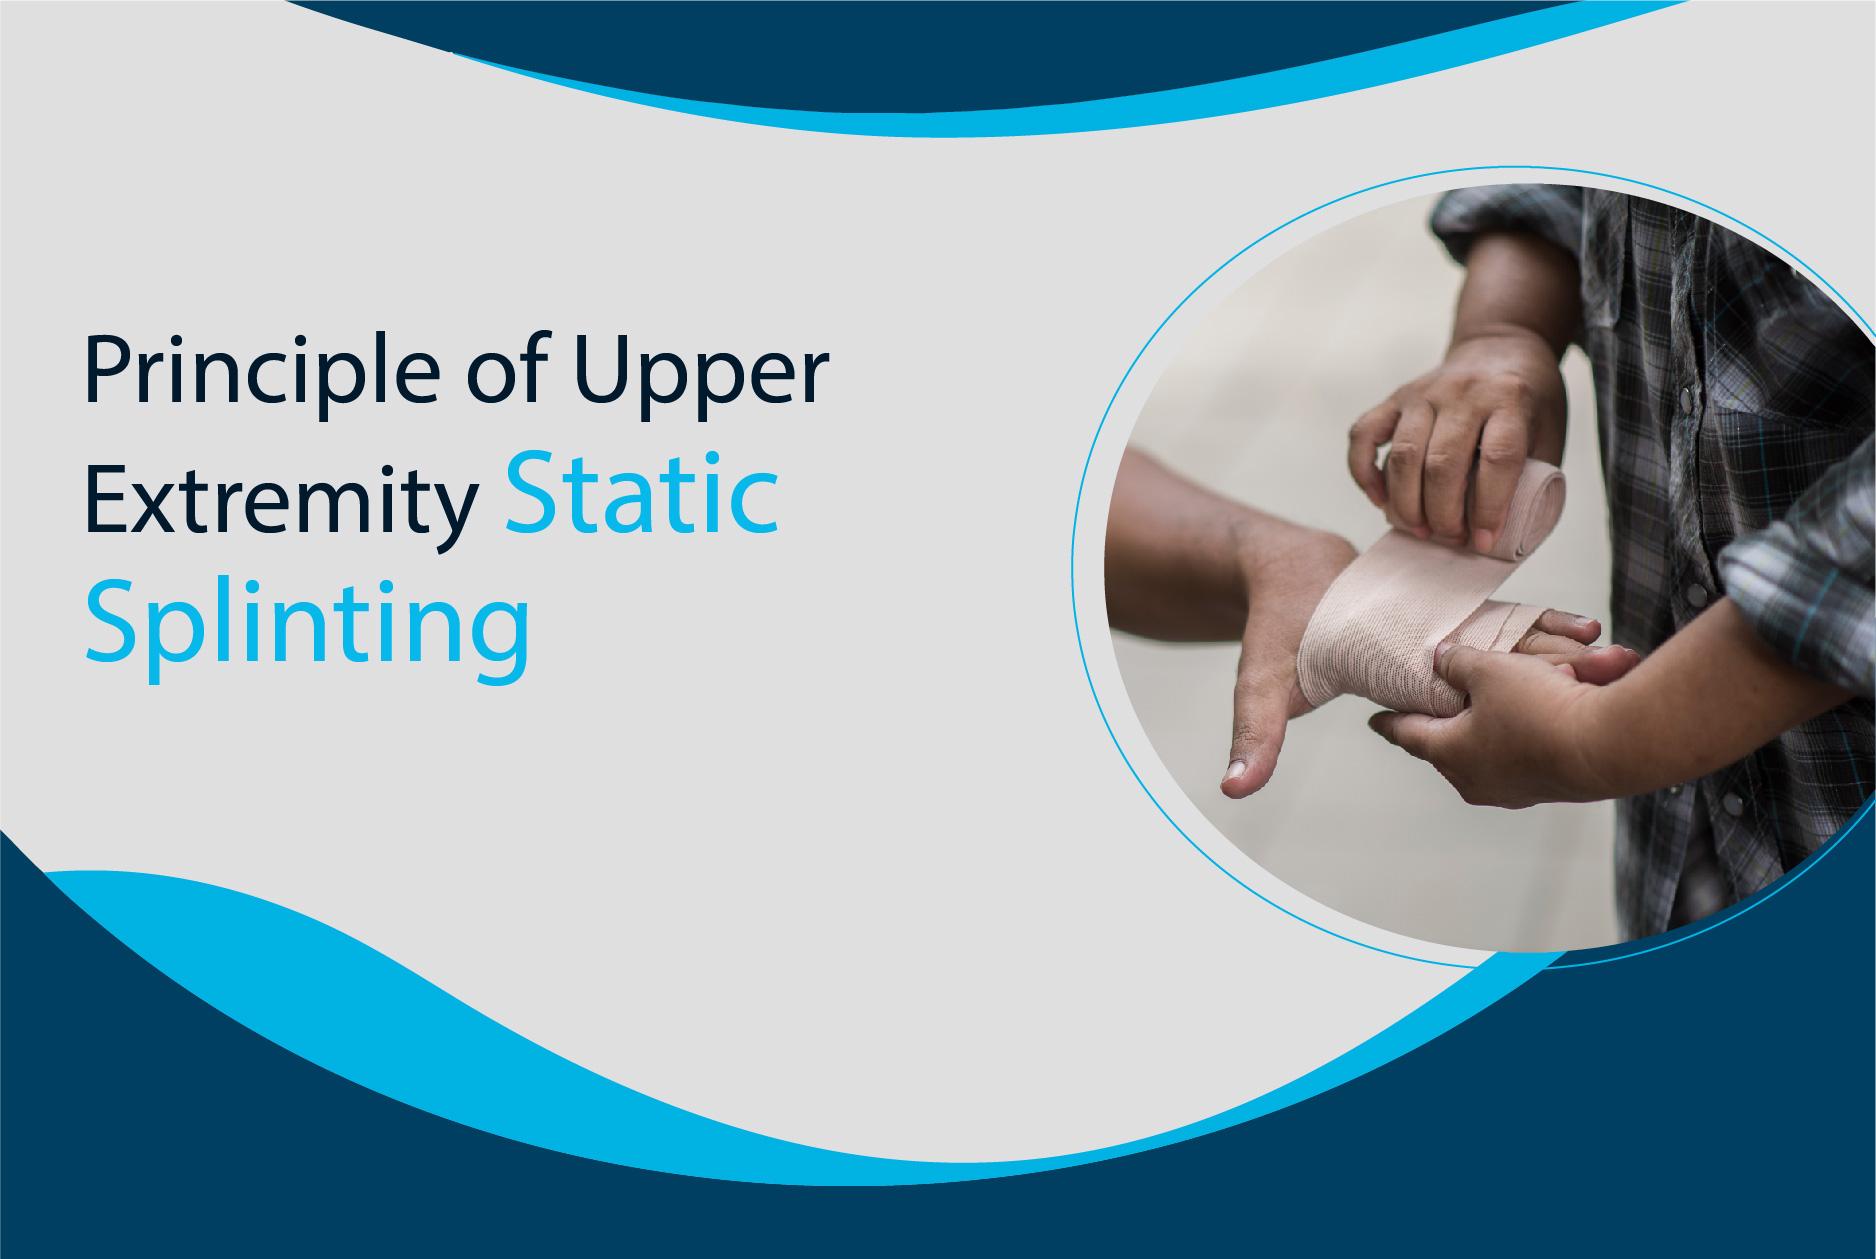 Principle of Upper Extremity Static Splinting